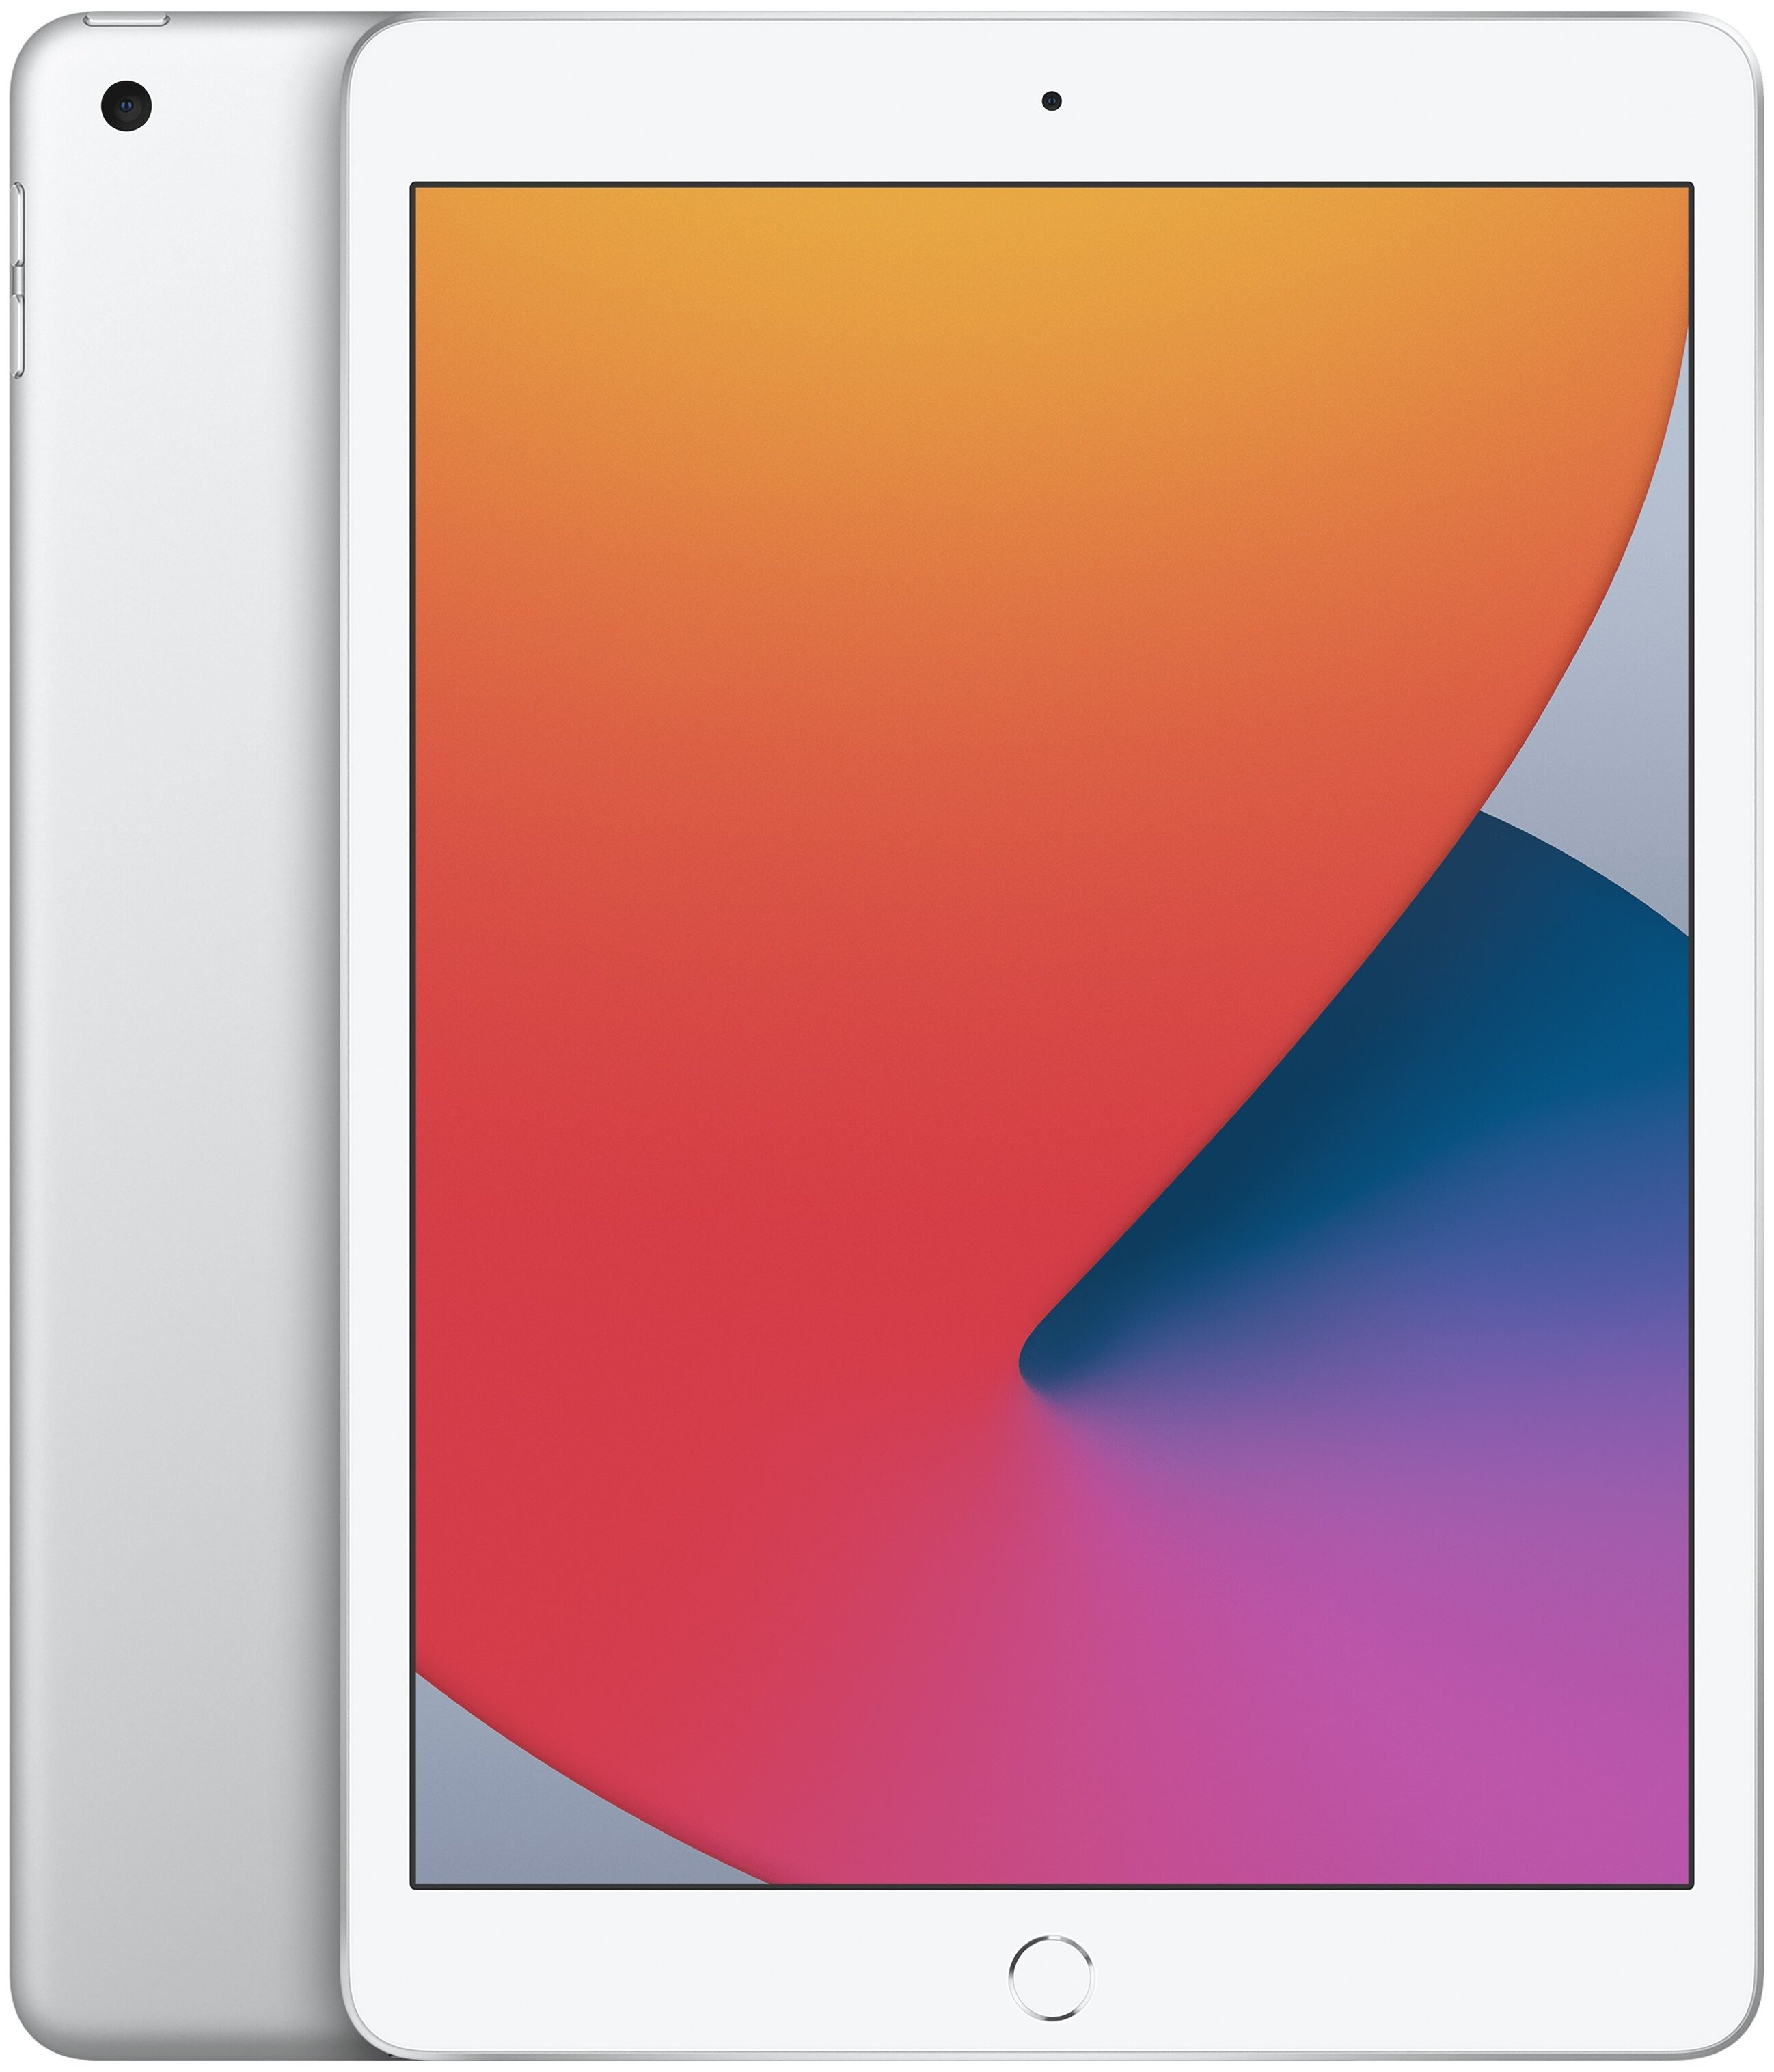 Apple iPad (2020) 128Gb Wi-Fi - камеры: основная 8МП, фронтальная 1.20МП